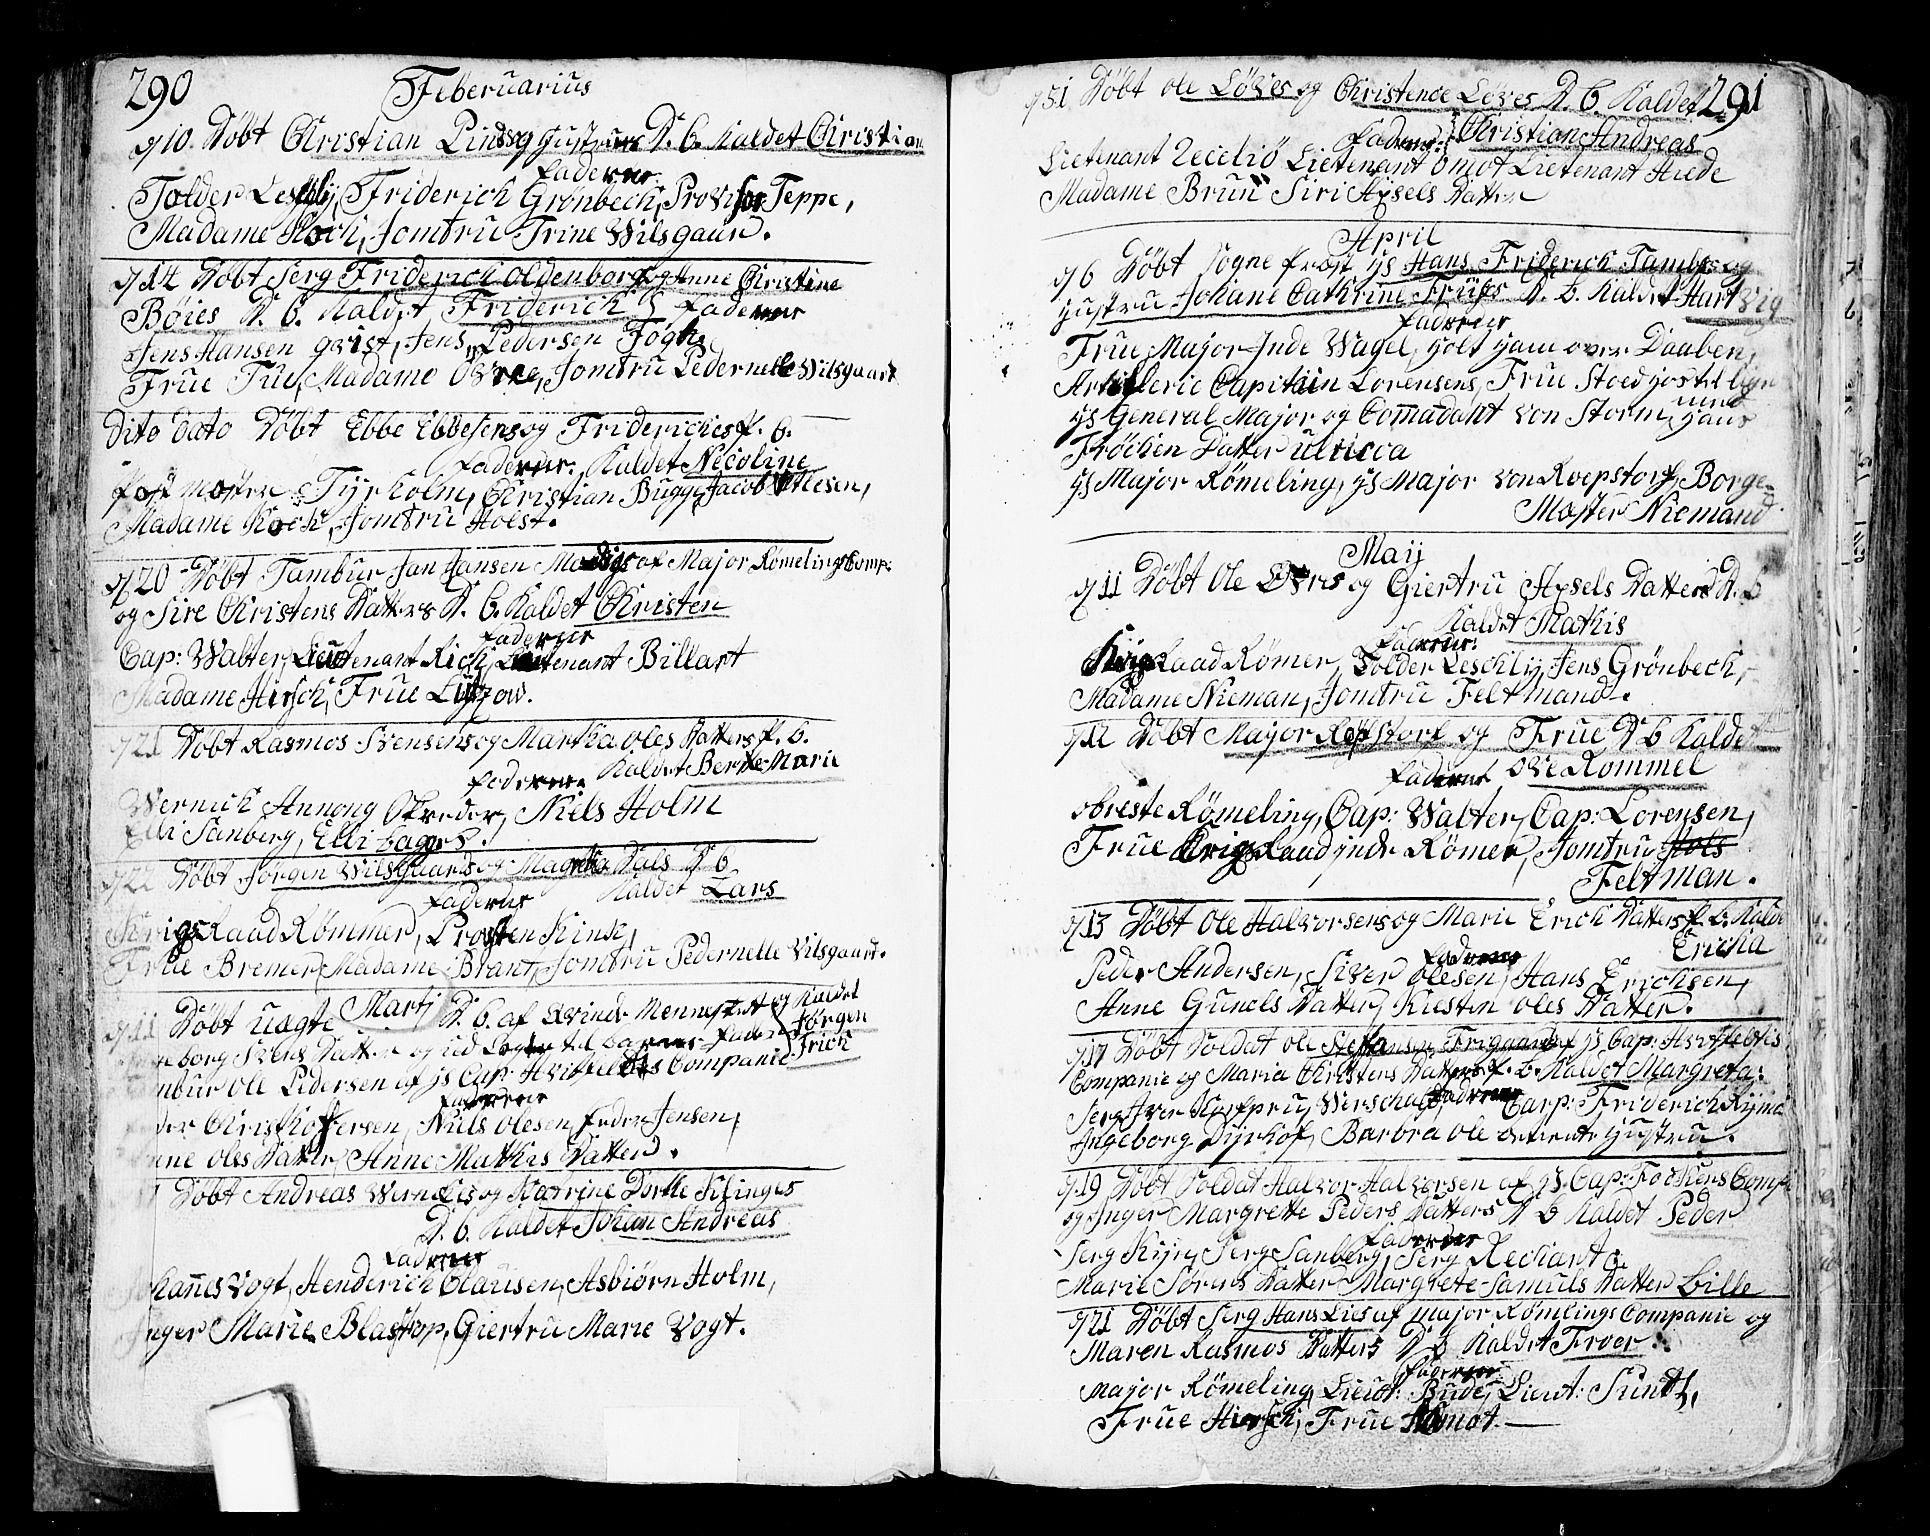 SAO, Fredrikstad prestekontor Kirkebøker, F/Fa/L0002: Parish register (official) no. 2, 1750-1804, p. 290-291